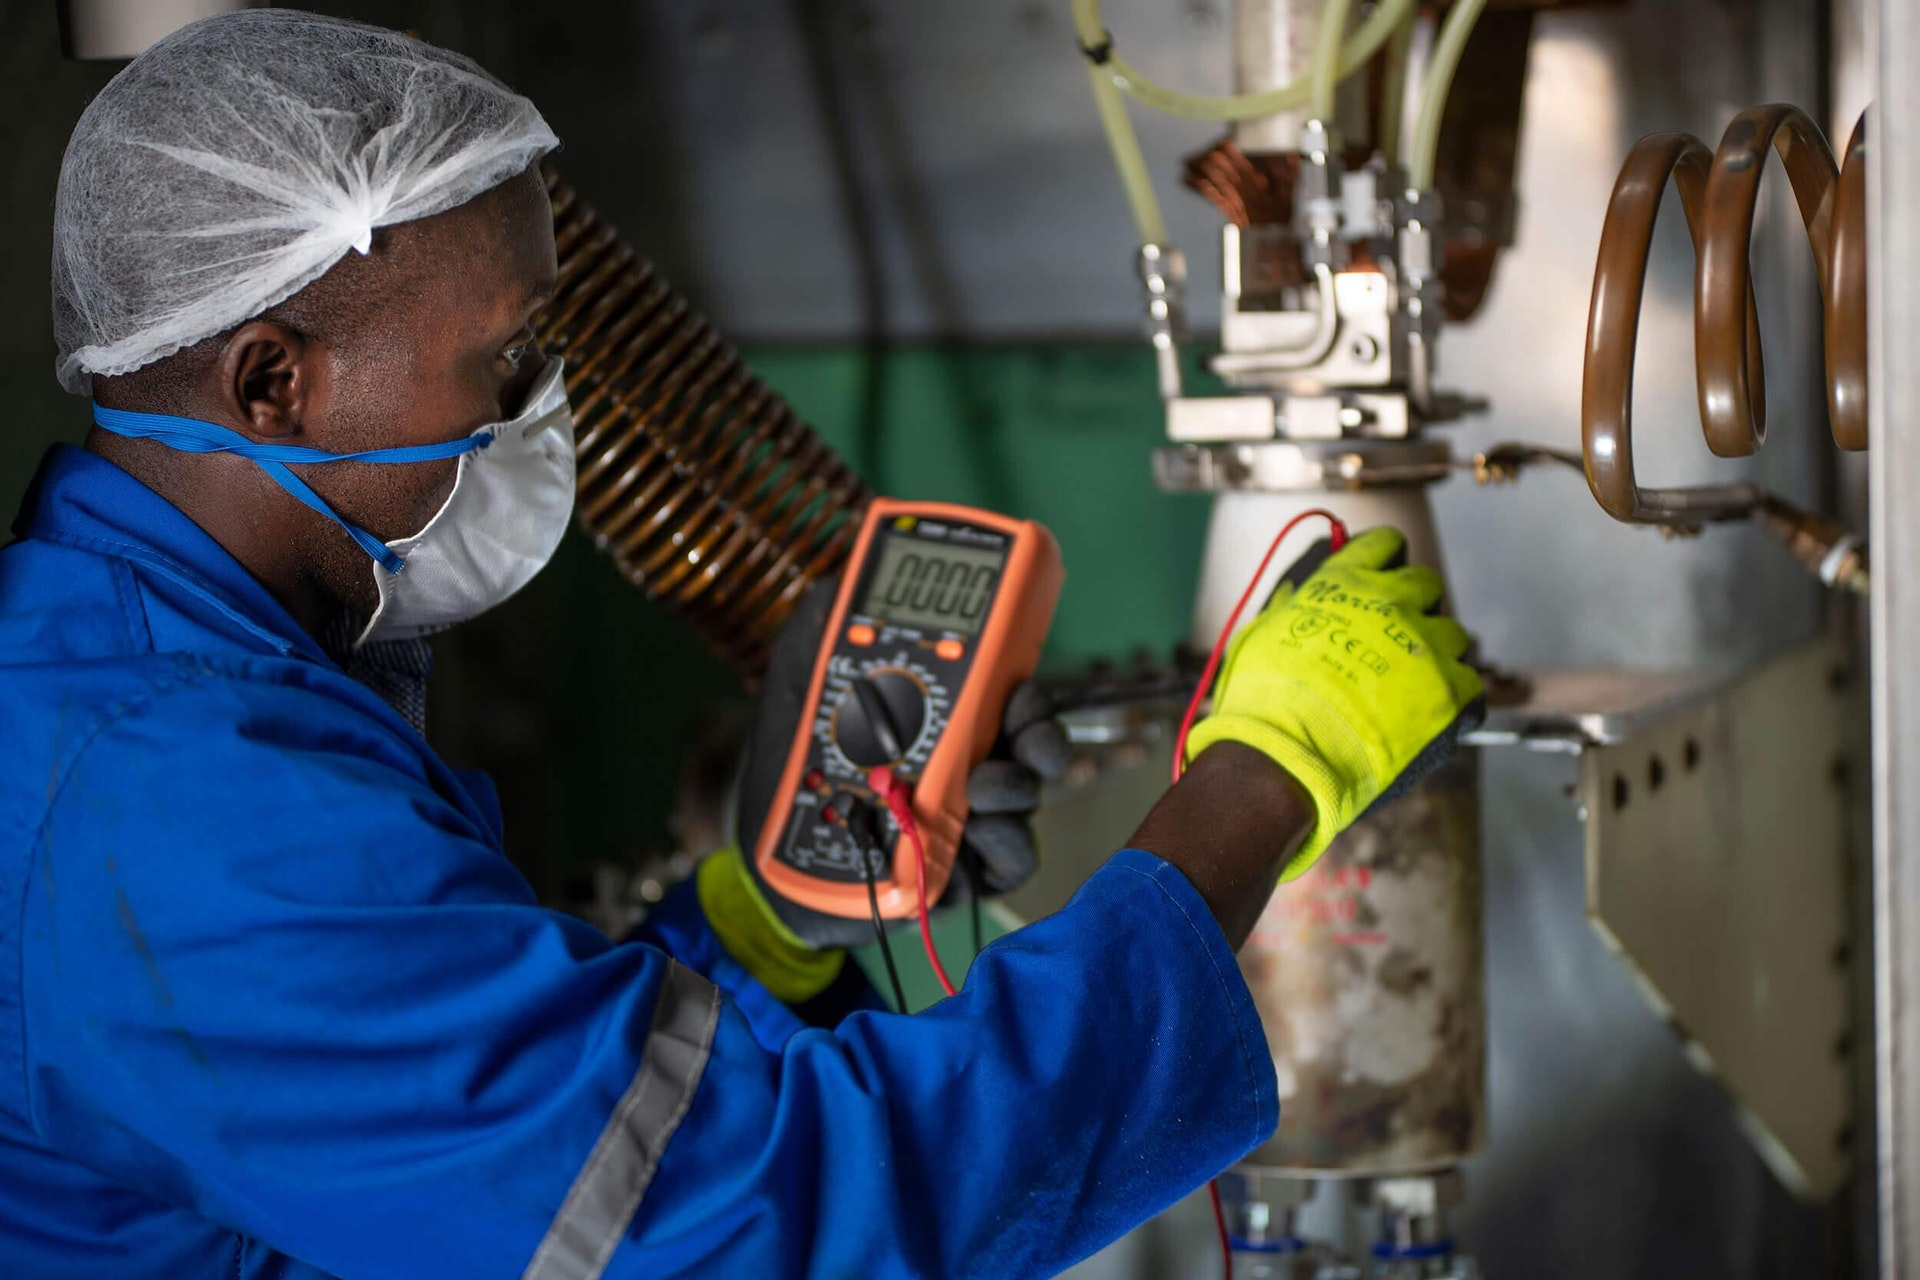 Hazardous waste inspection south africa